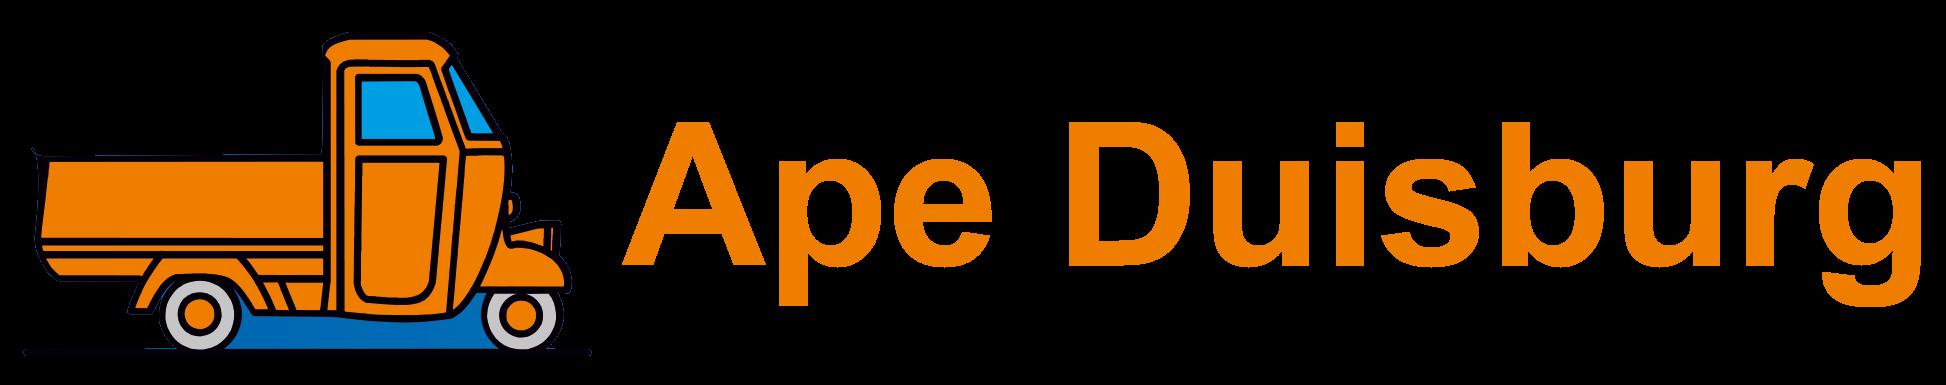 Ape Duisburg